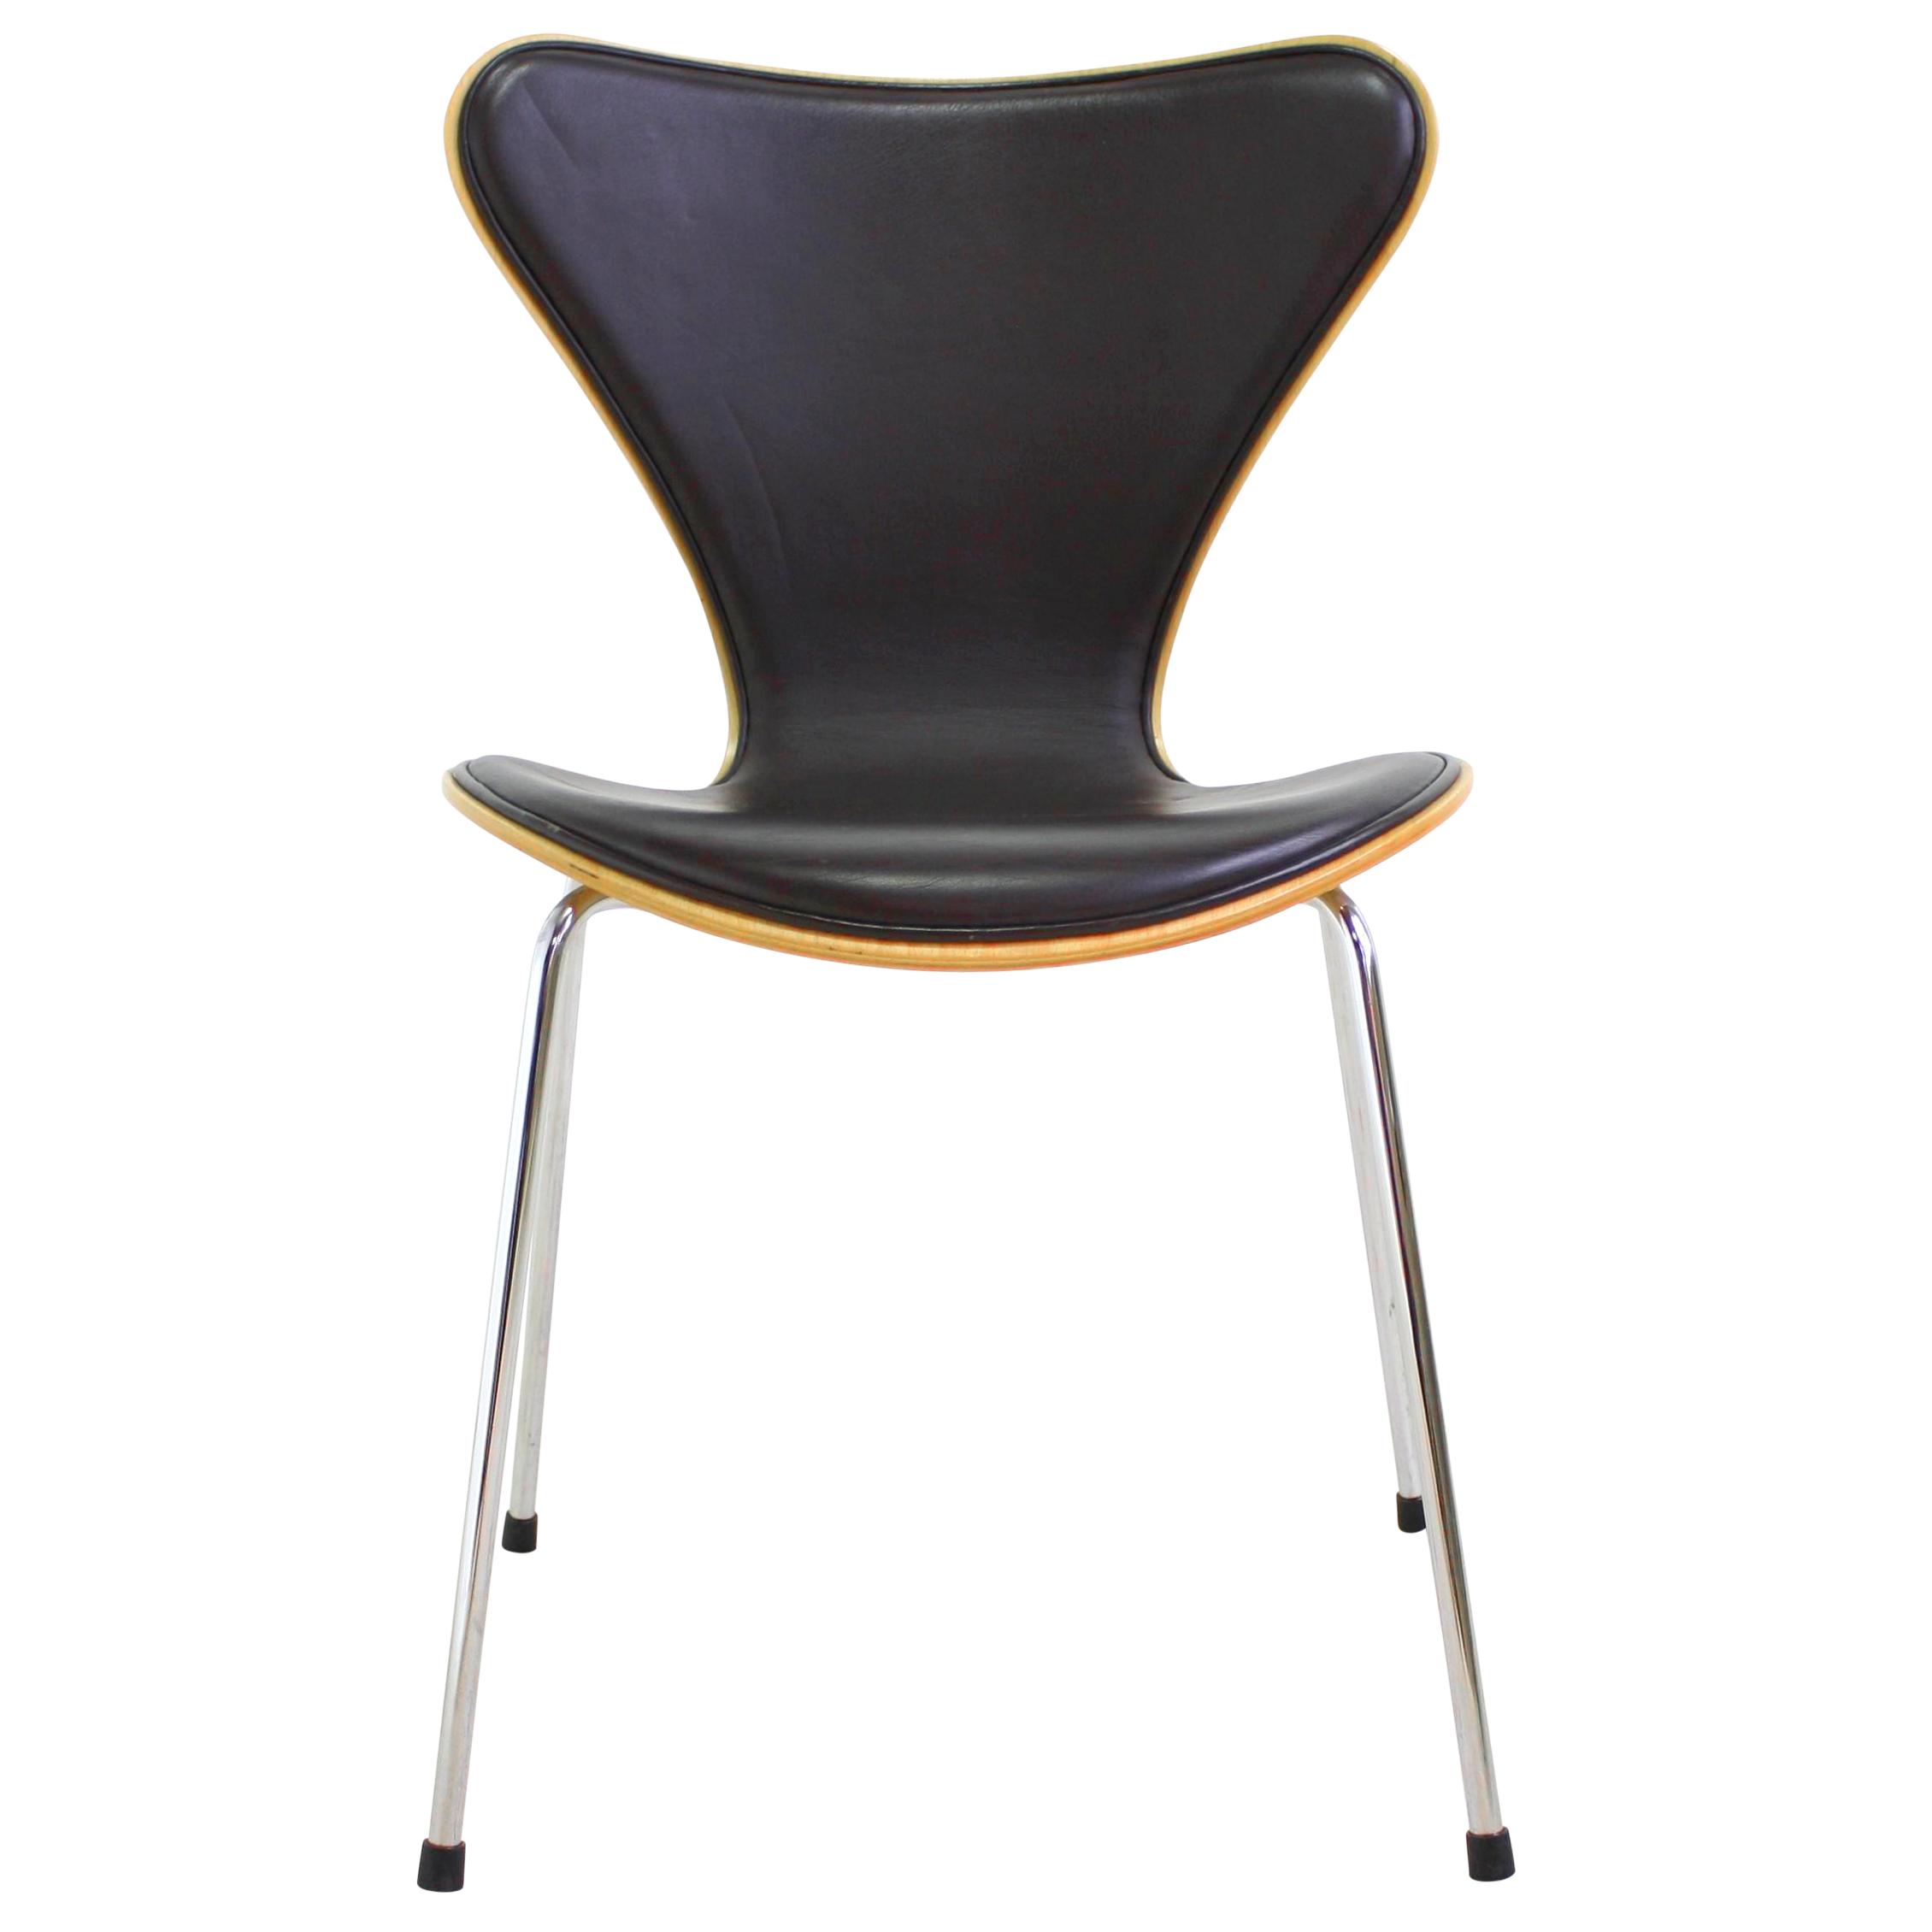 arne jacobsen series 7 brn chair chairish. Black Bedroom Furniture Sets. Home Design Ideas